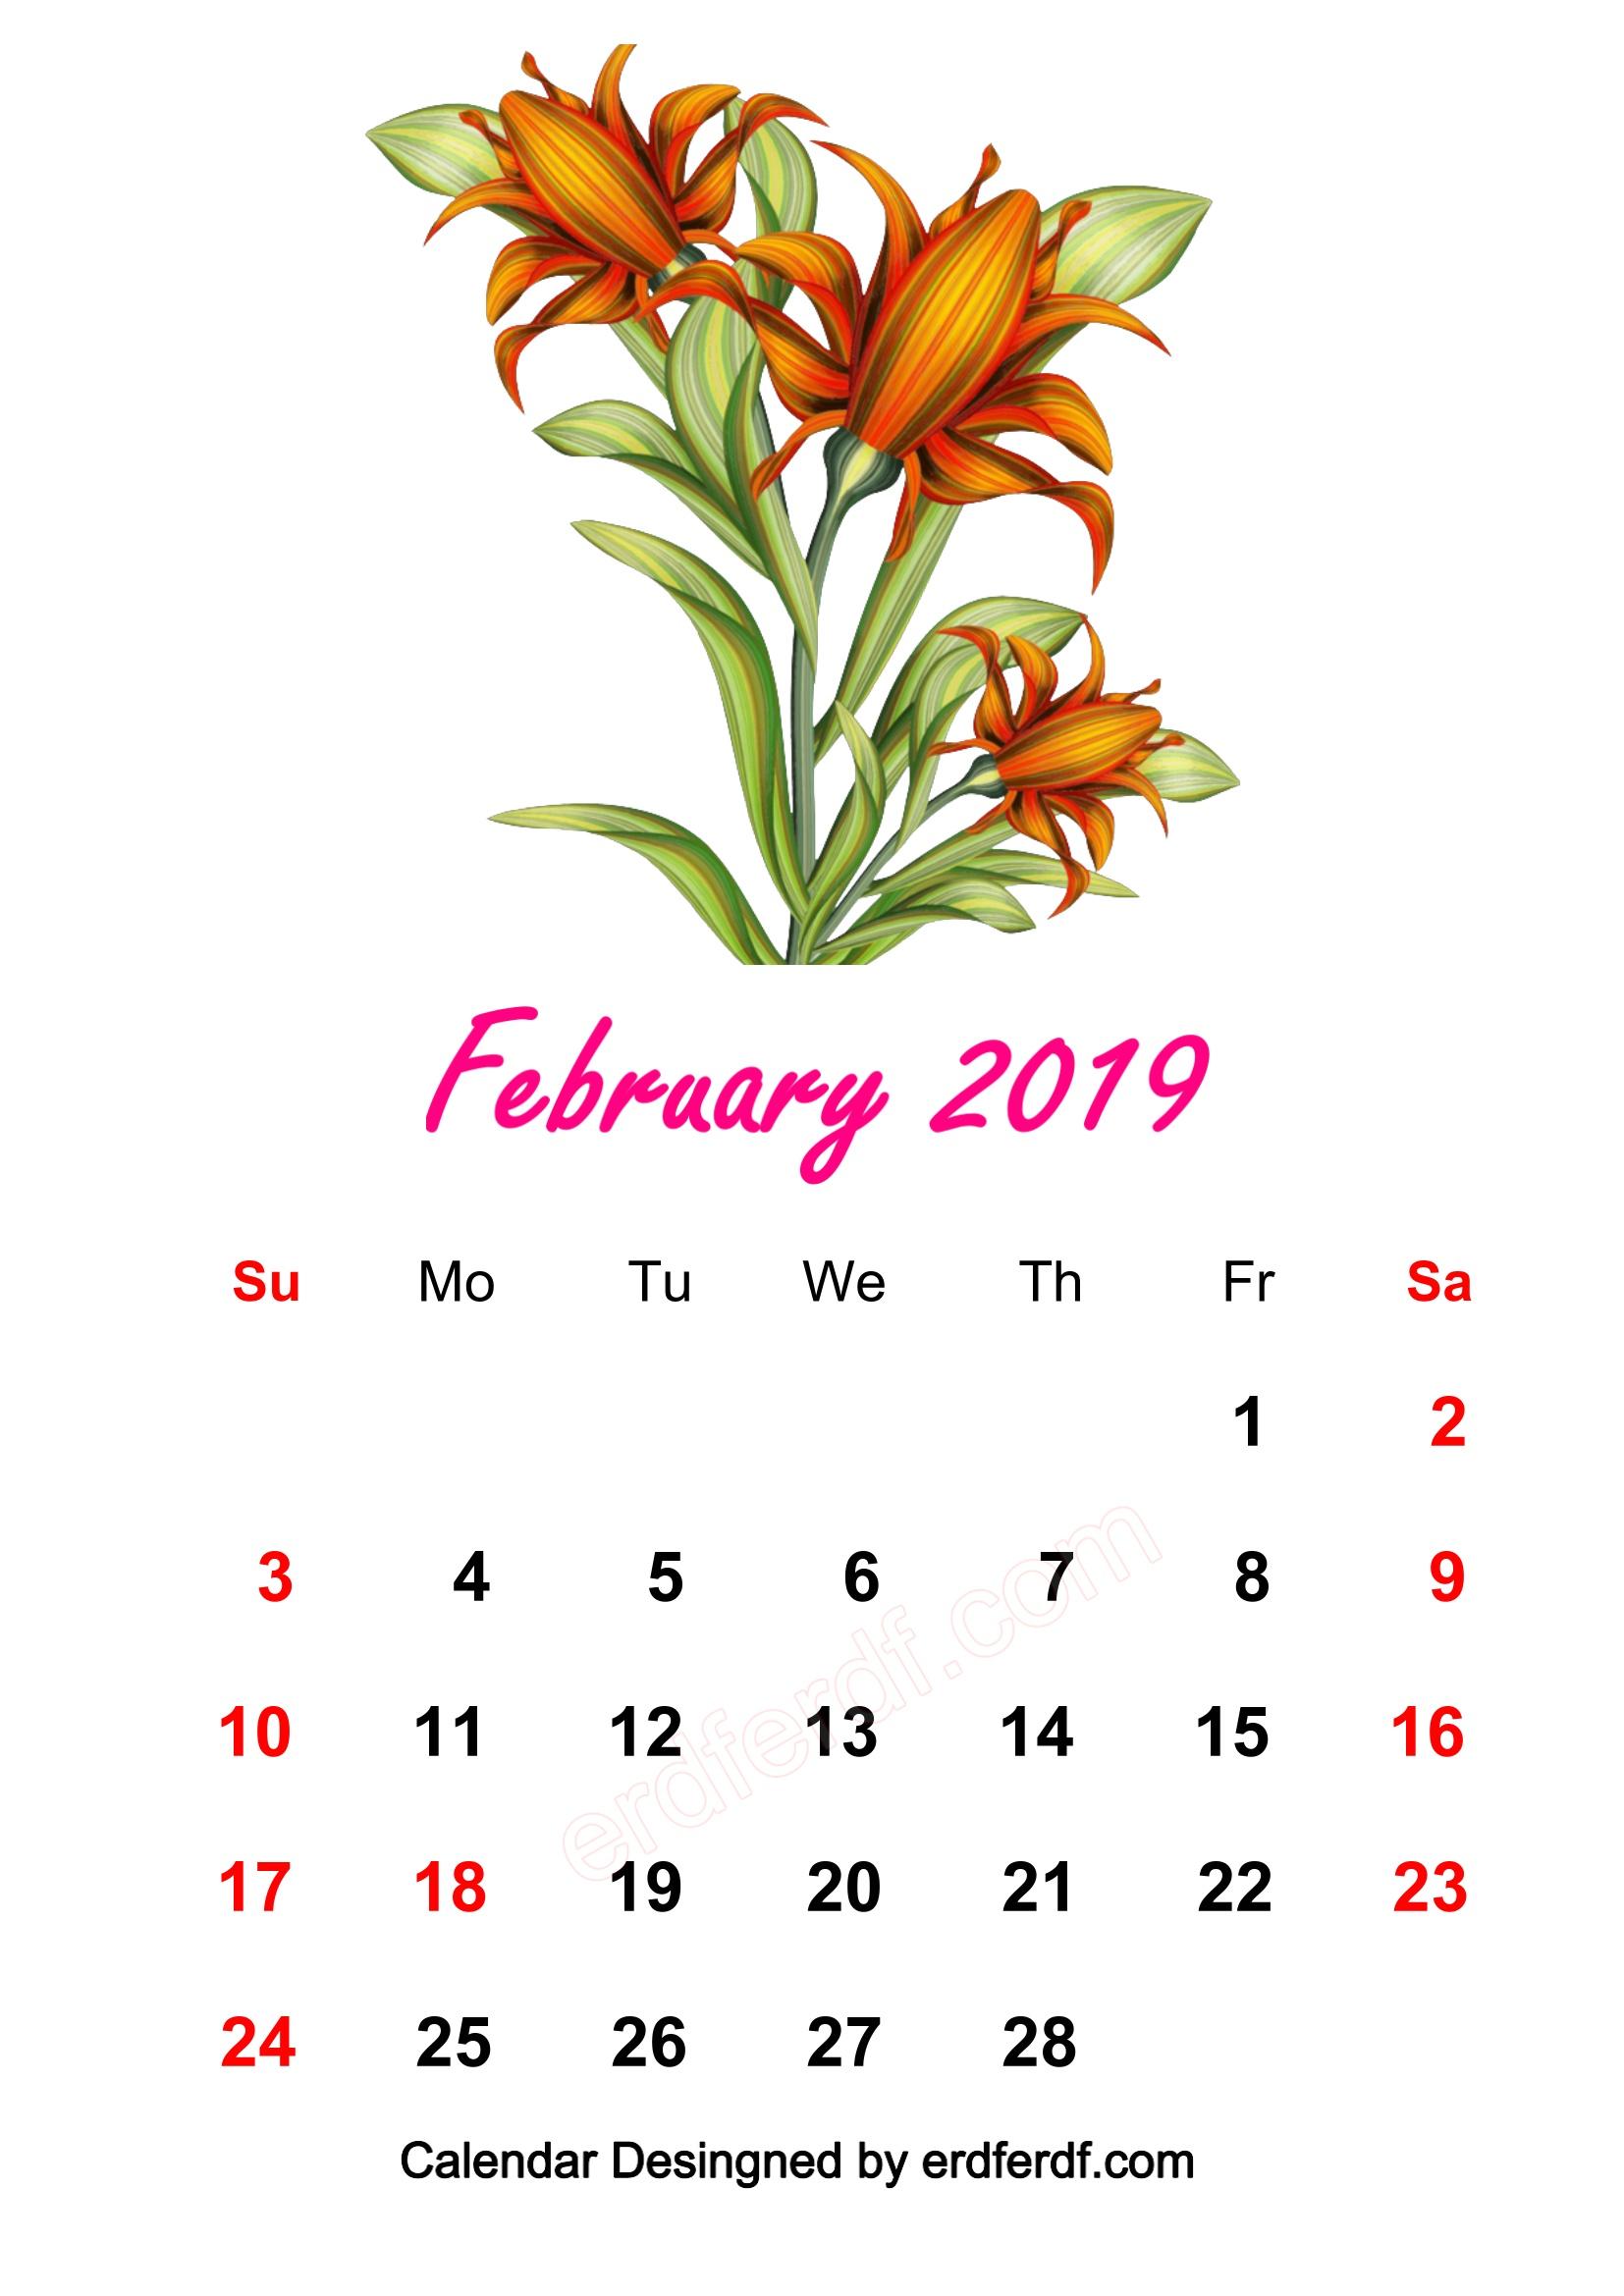 5 February 2019 HD Calendar Wallpapers